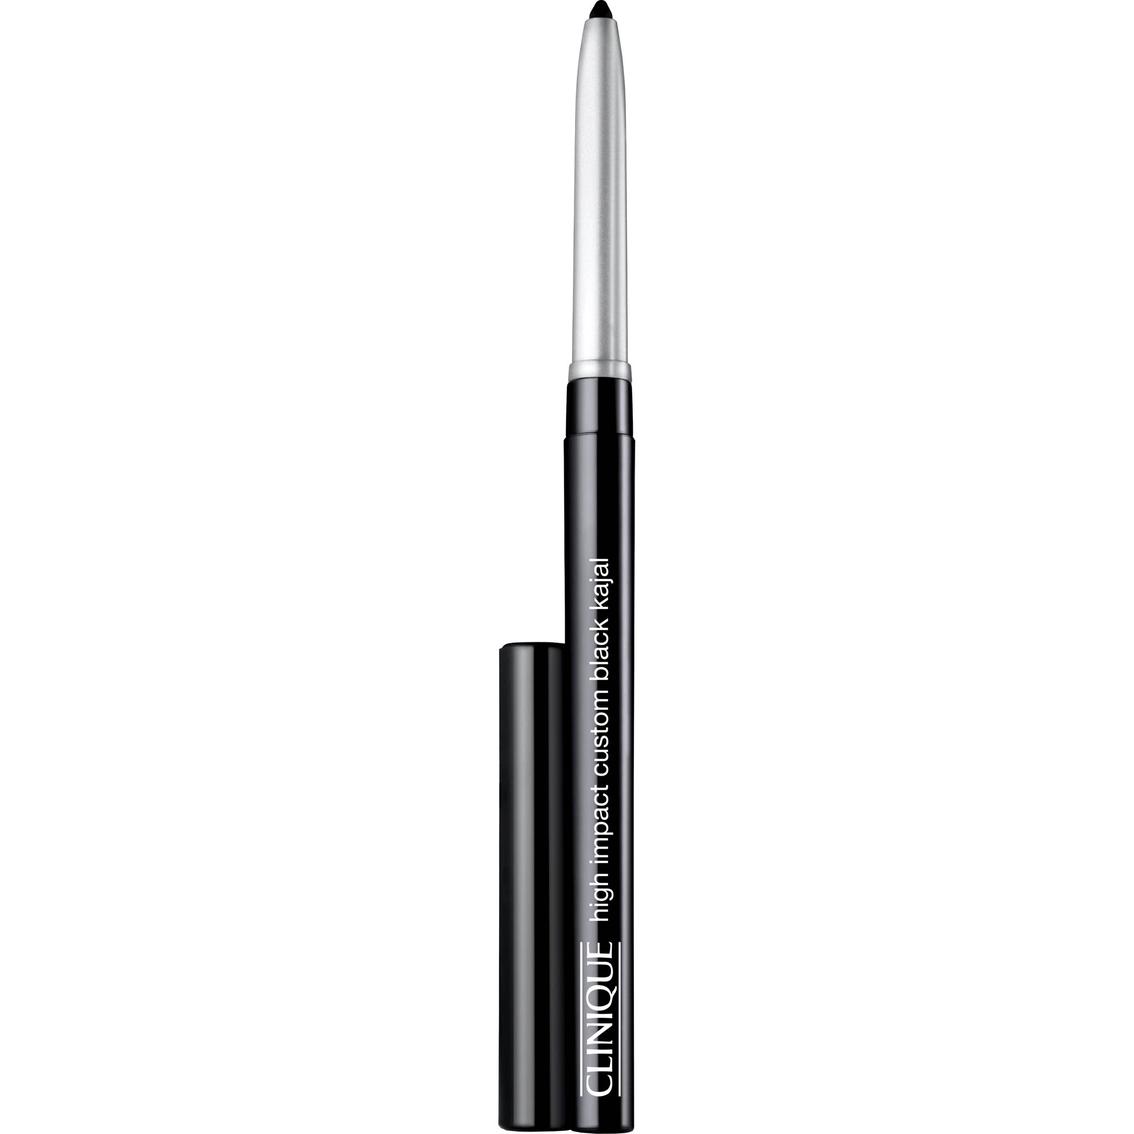 Clinique High Impact Custom Black Kajal Eyeliner Pencil Eyeliner